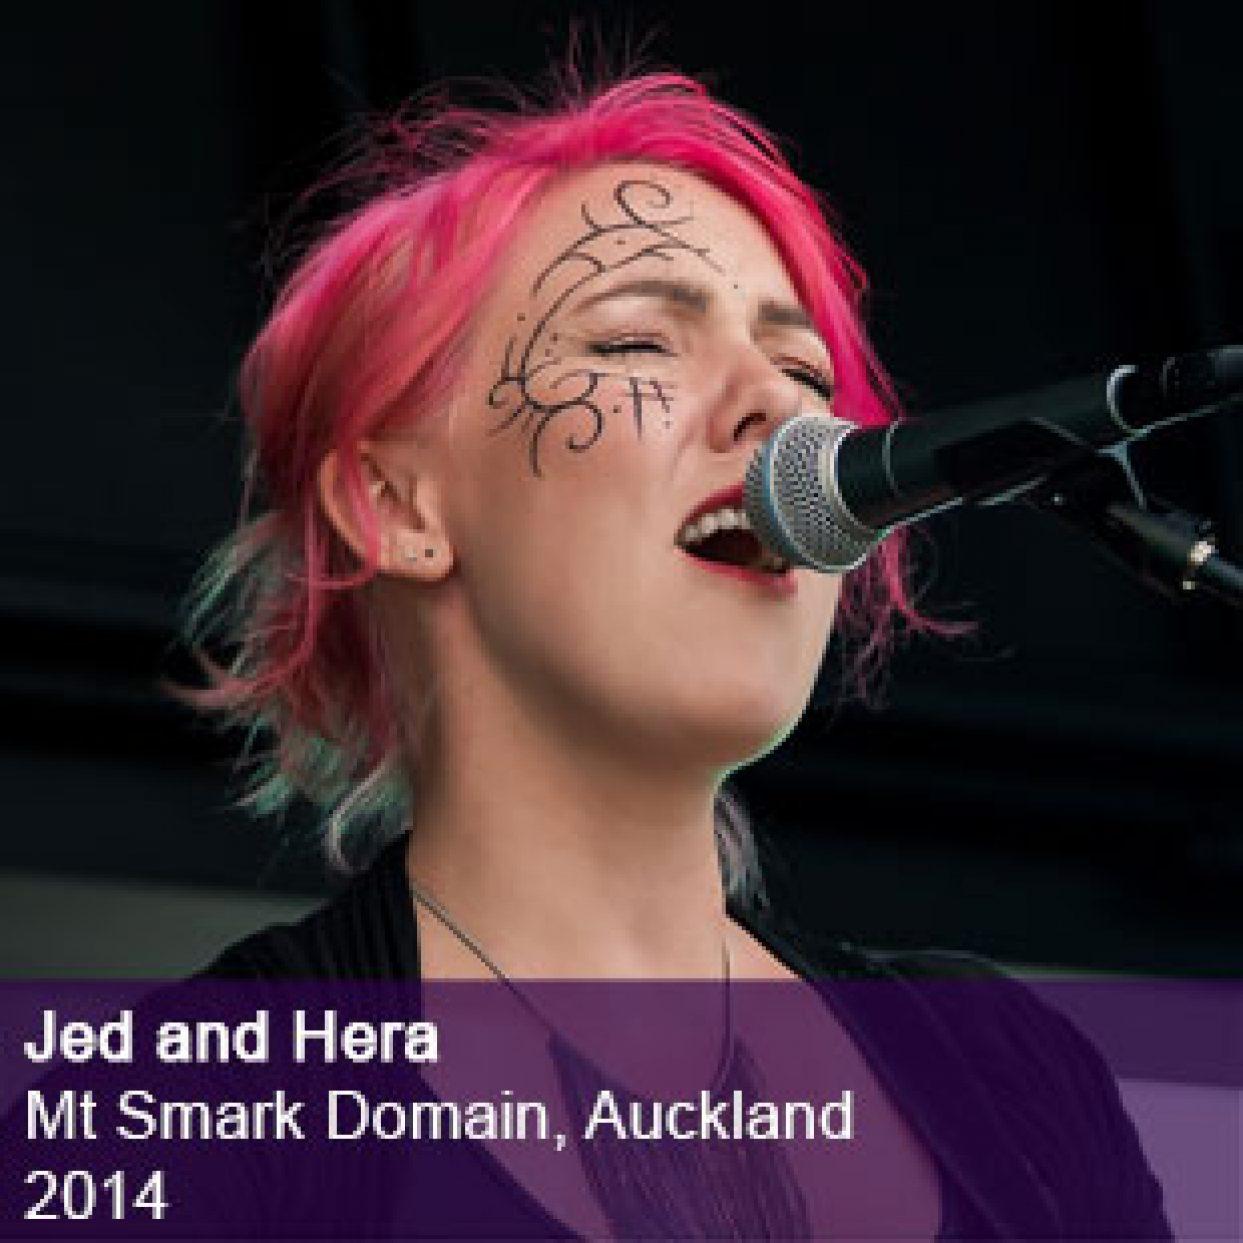 Jed and Hera Live